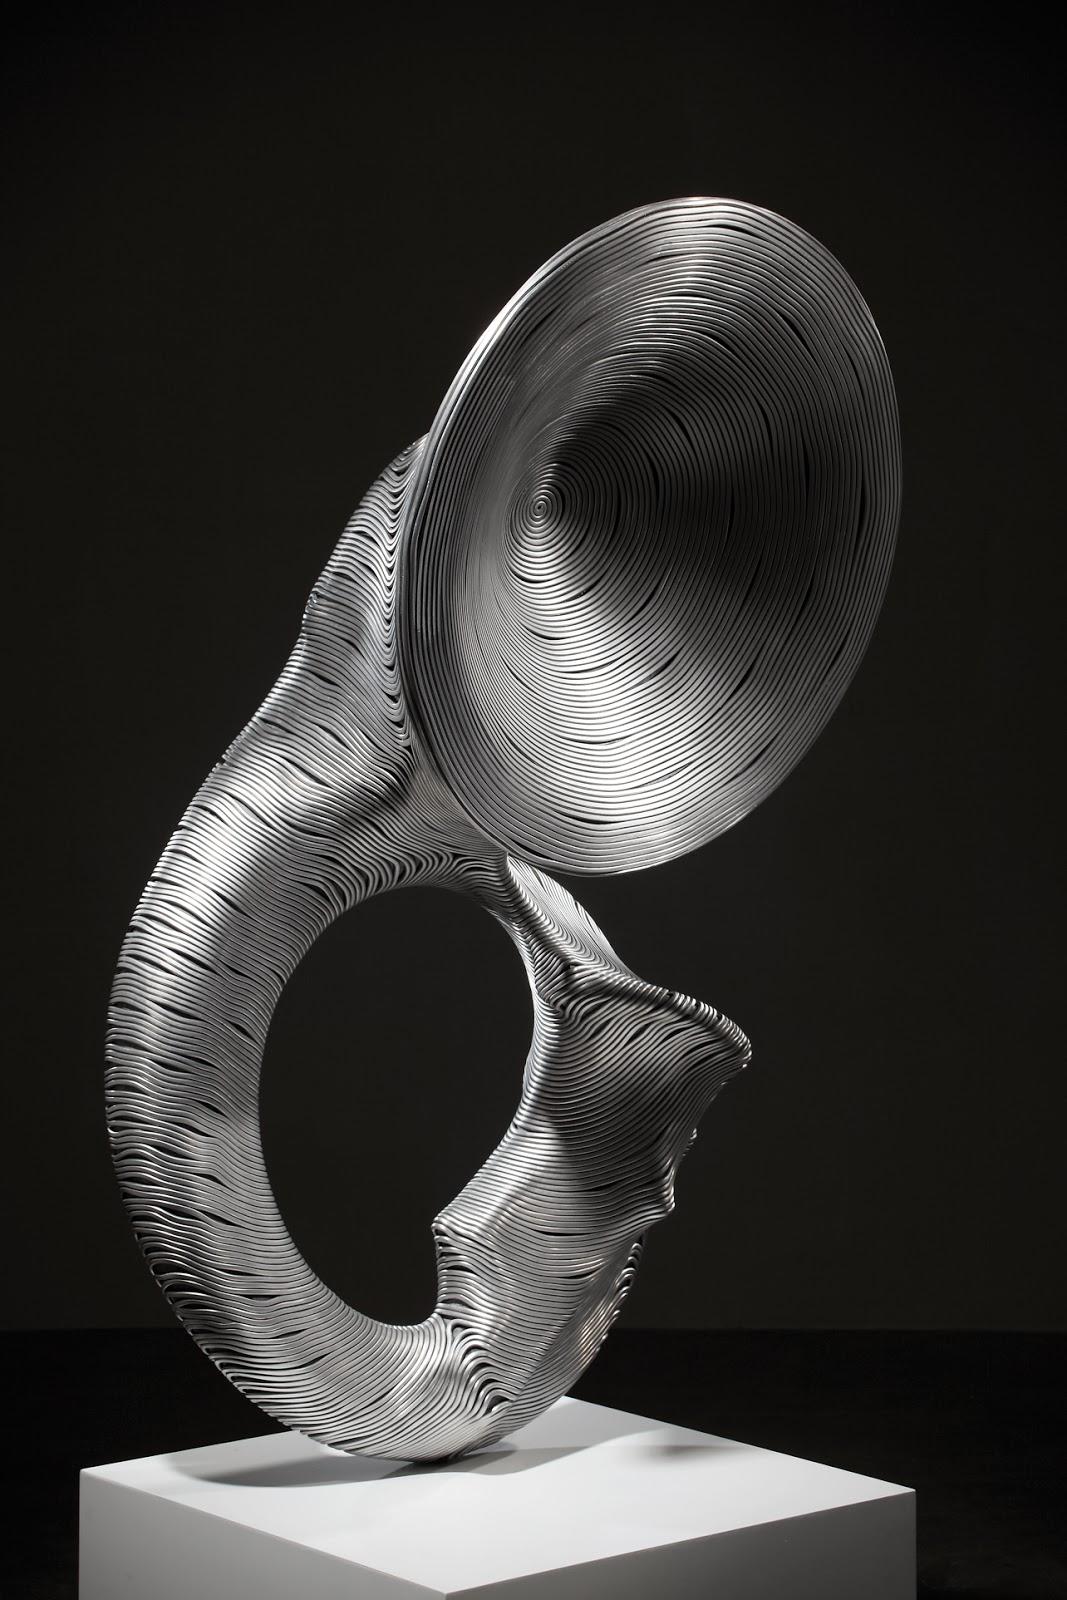 15-Sousaphone-Park-Seung-Mo-South-Korean-Artist-&-Sculptor-Wire-Sculpture-www-designstack-co